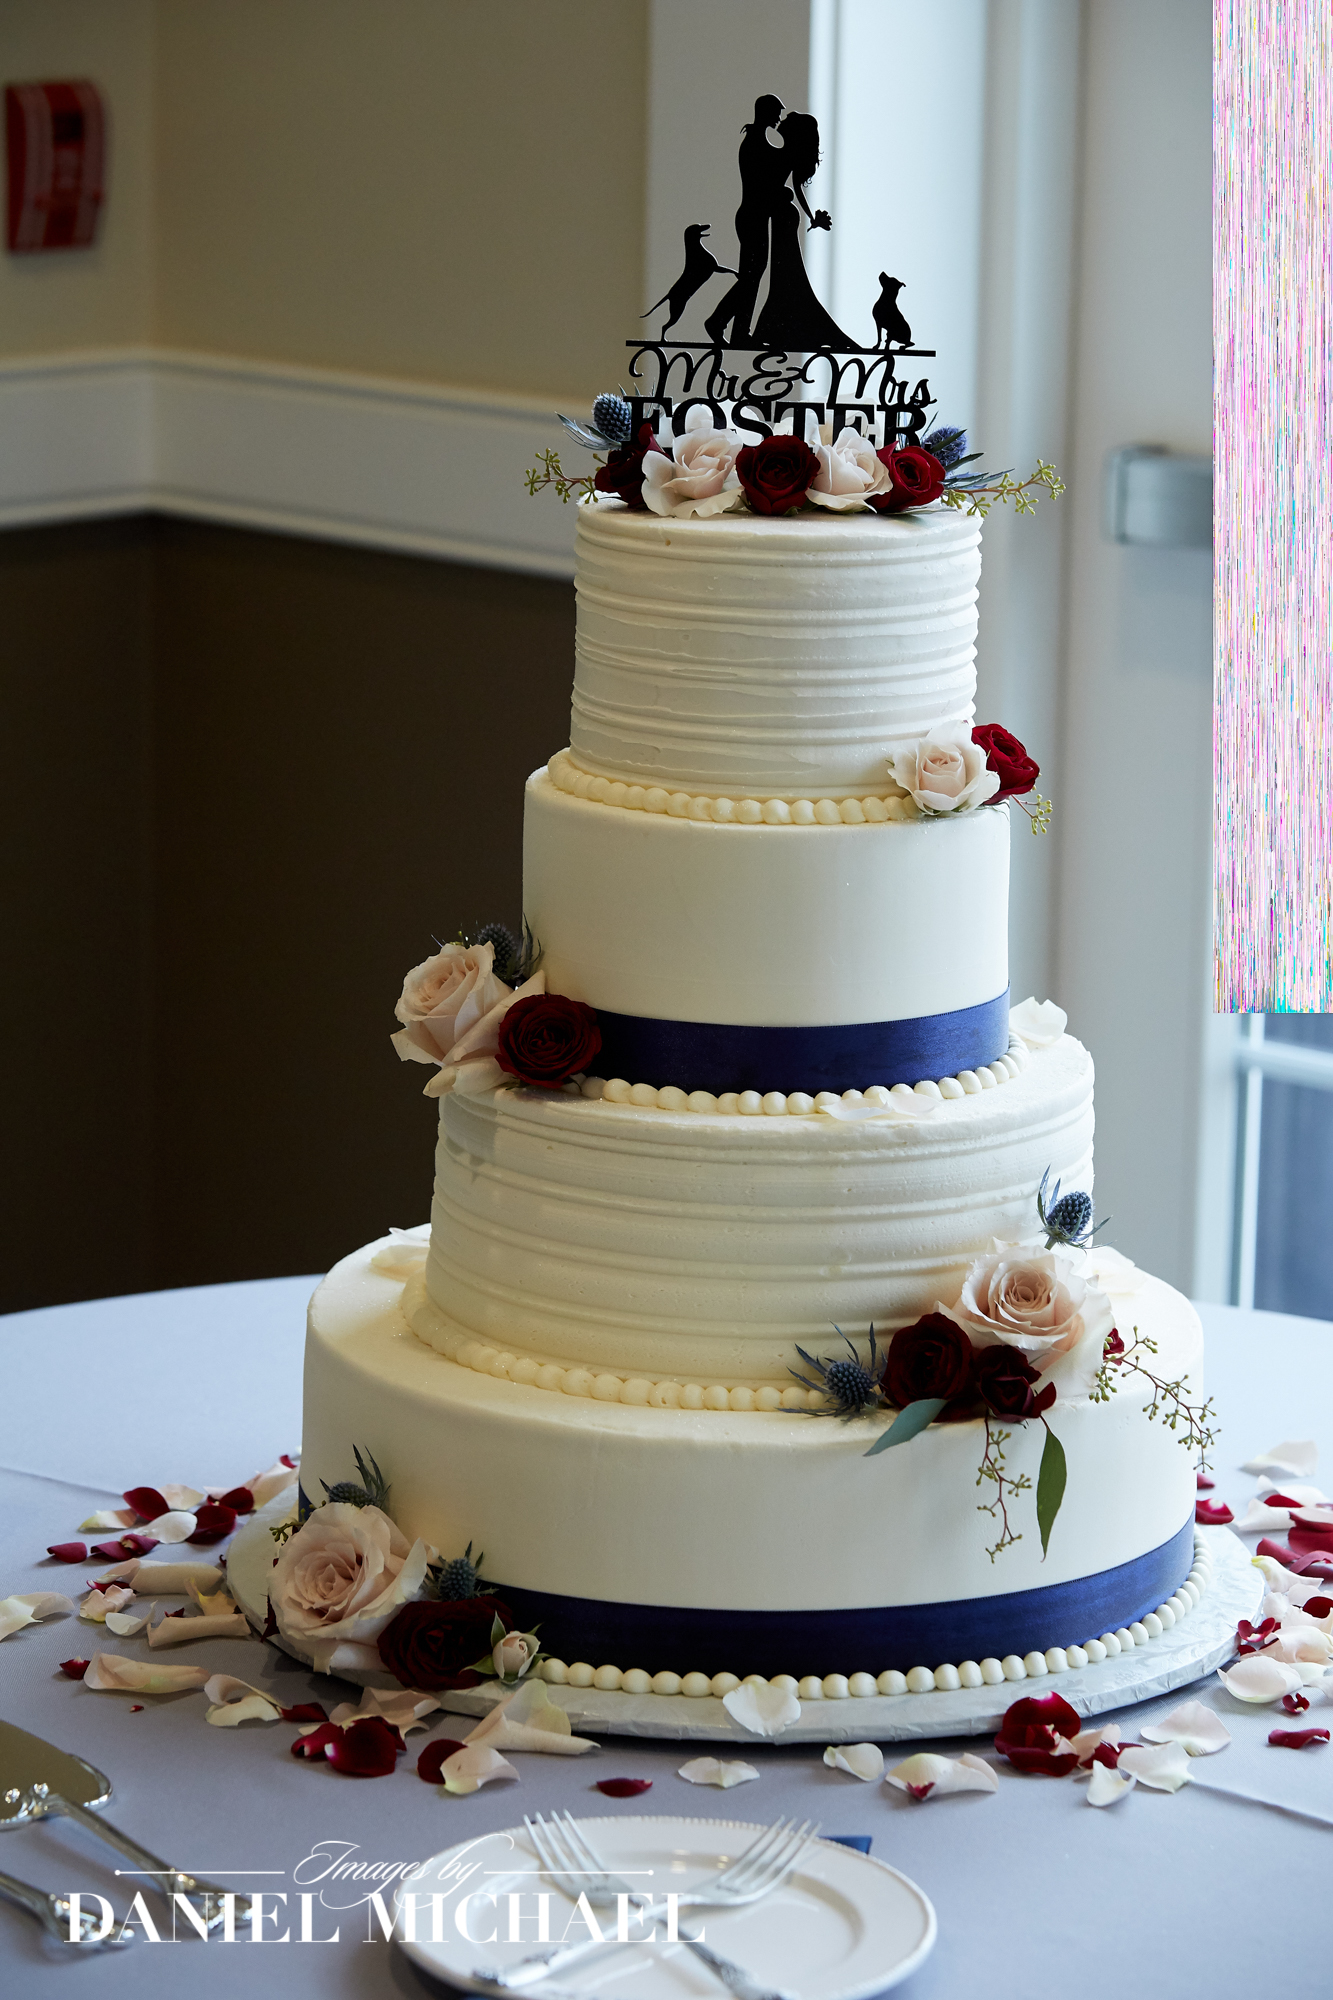 St catherine of siena miami wedding cakes